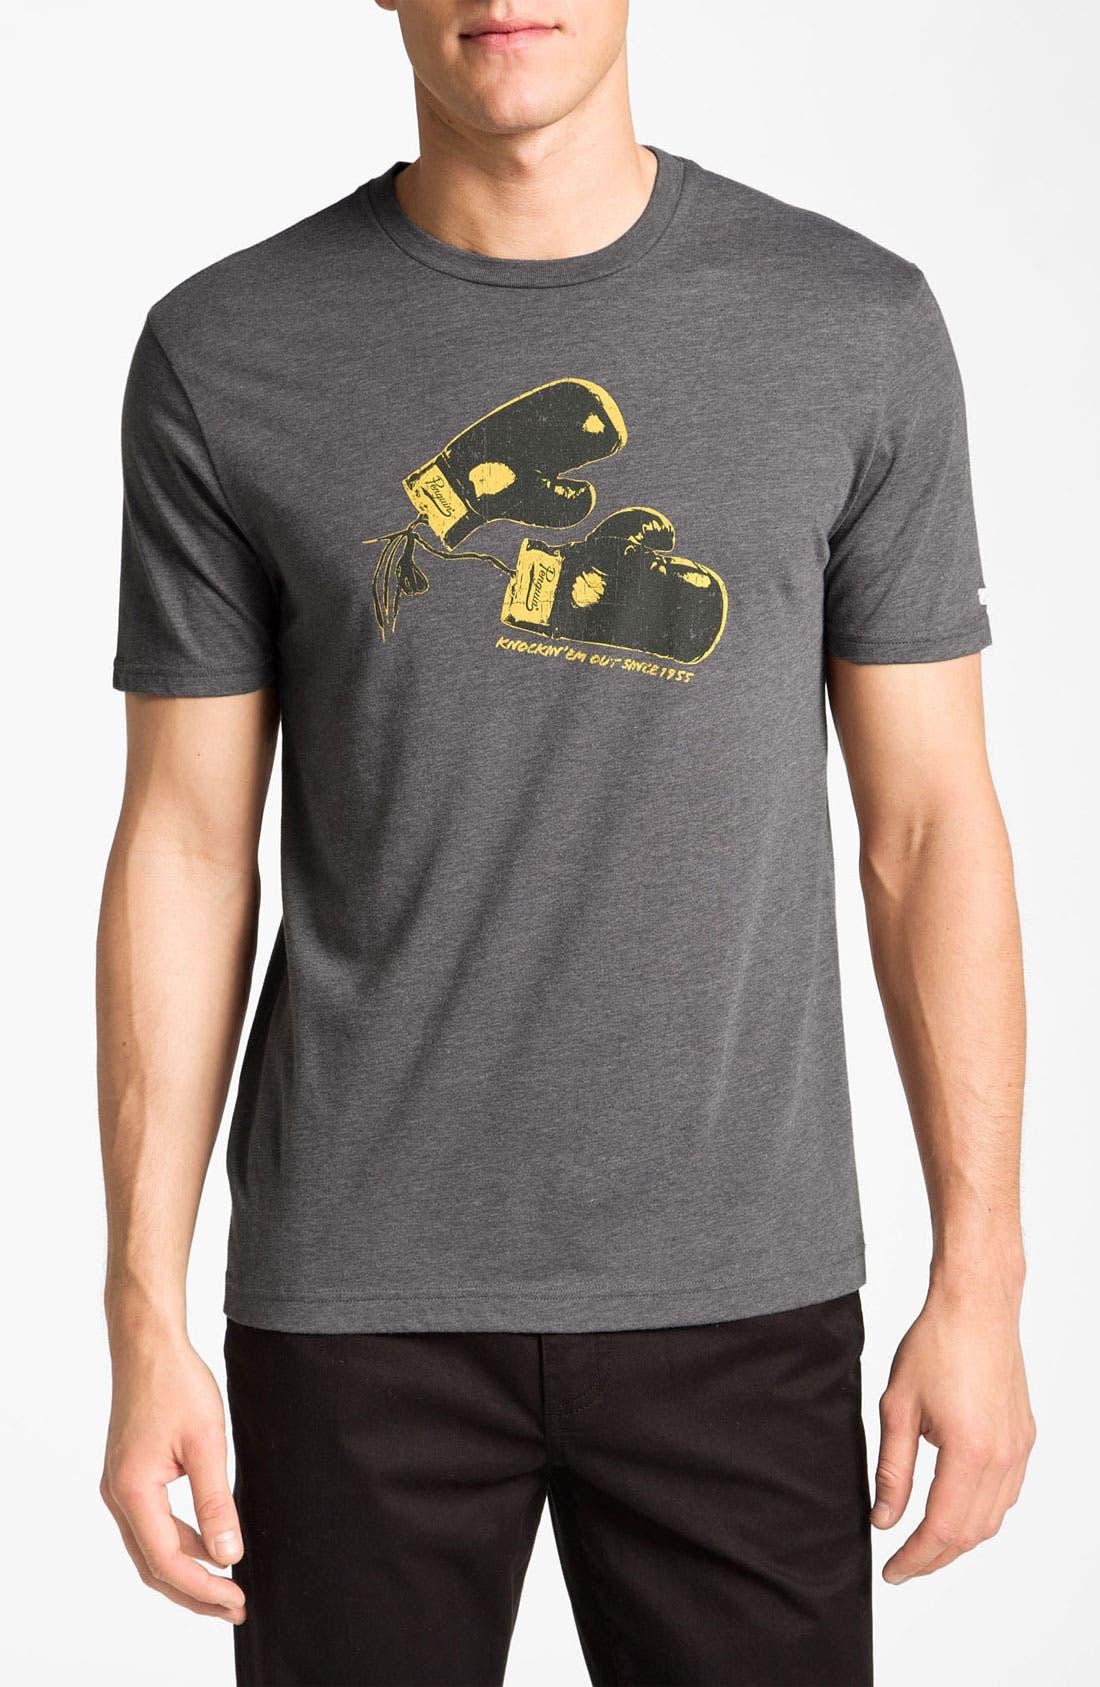 Alternate Image 1 Selected - Original Penguin 'Knock 'Em Out' Graphic Crewneck T-Shirt